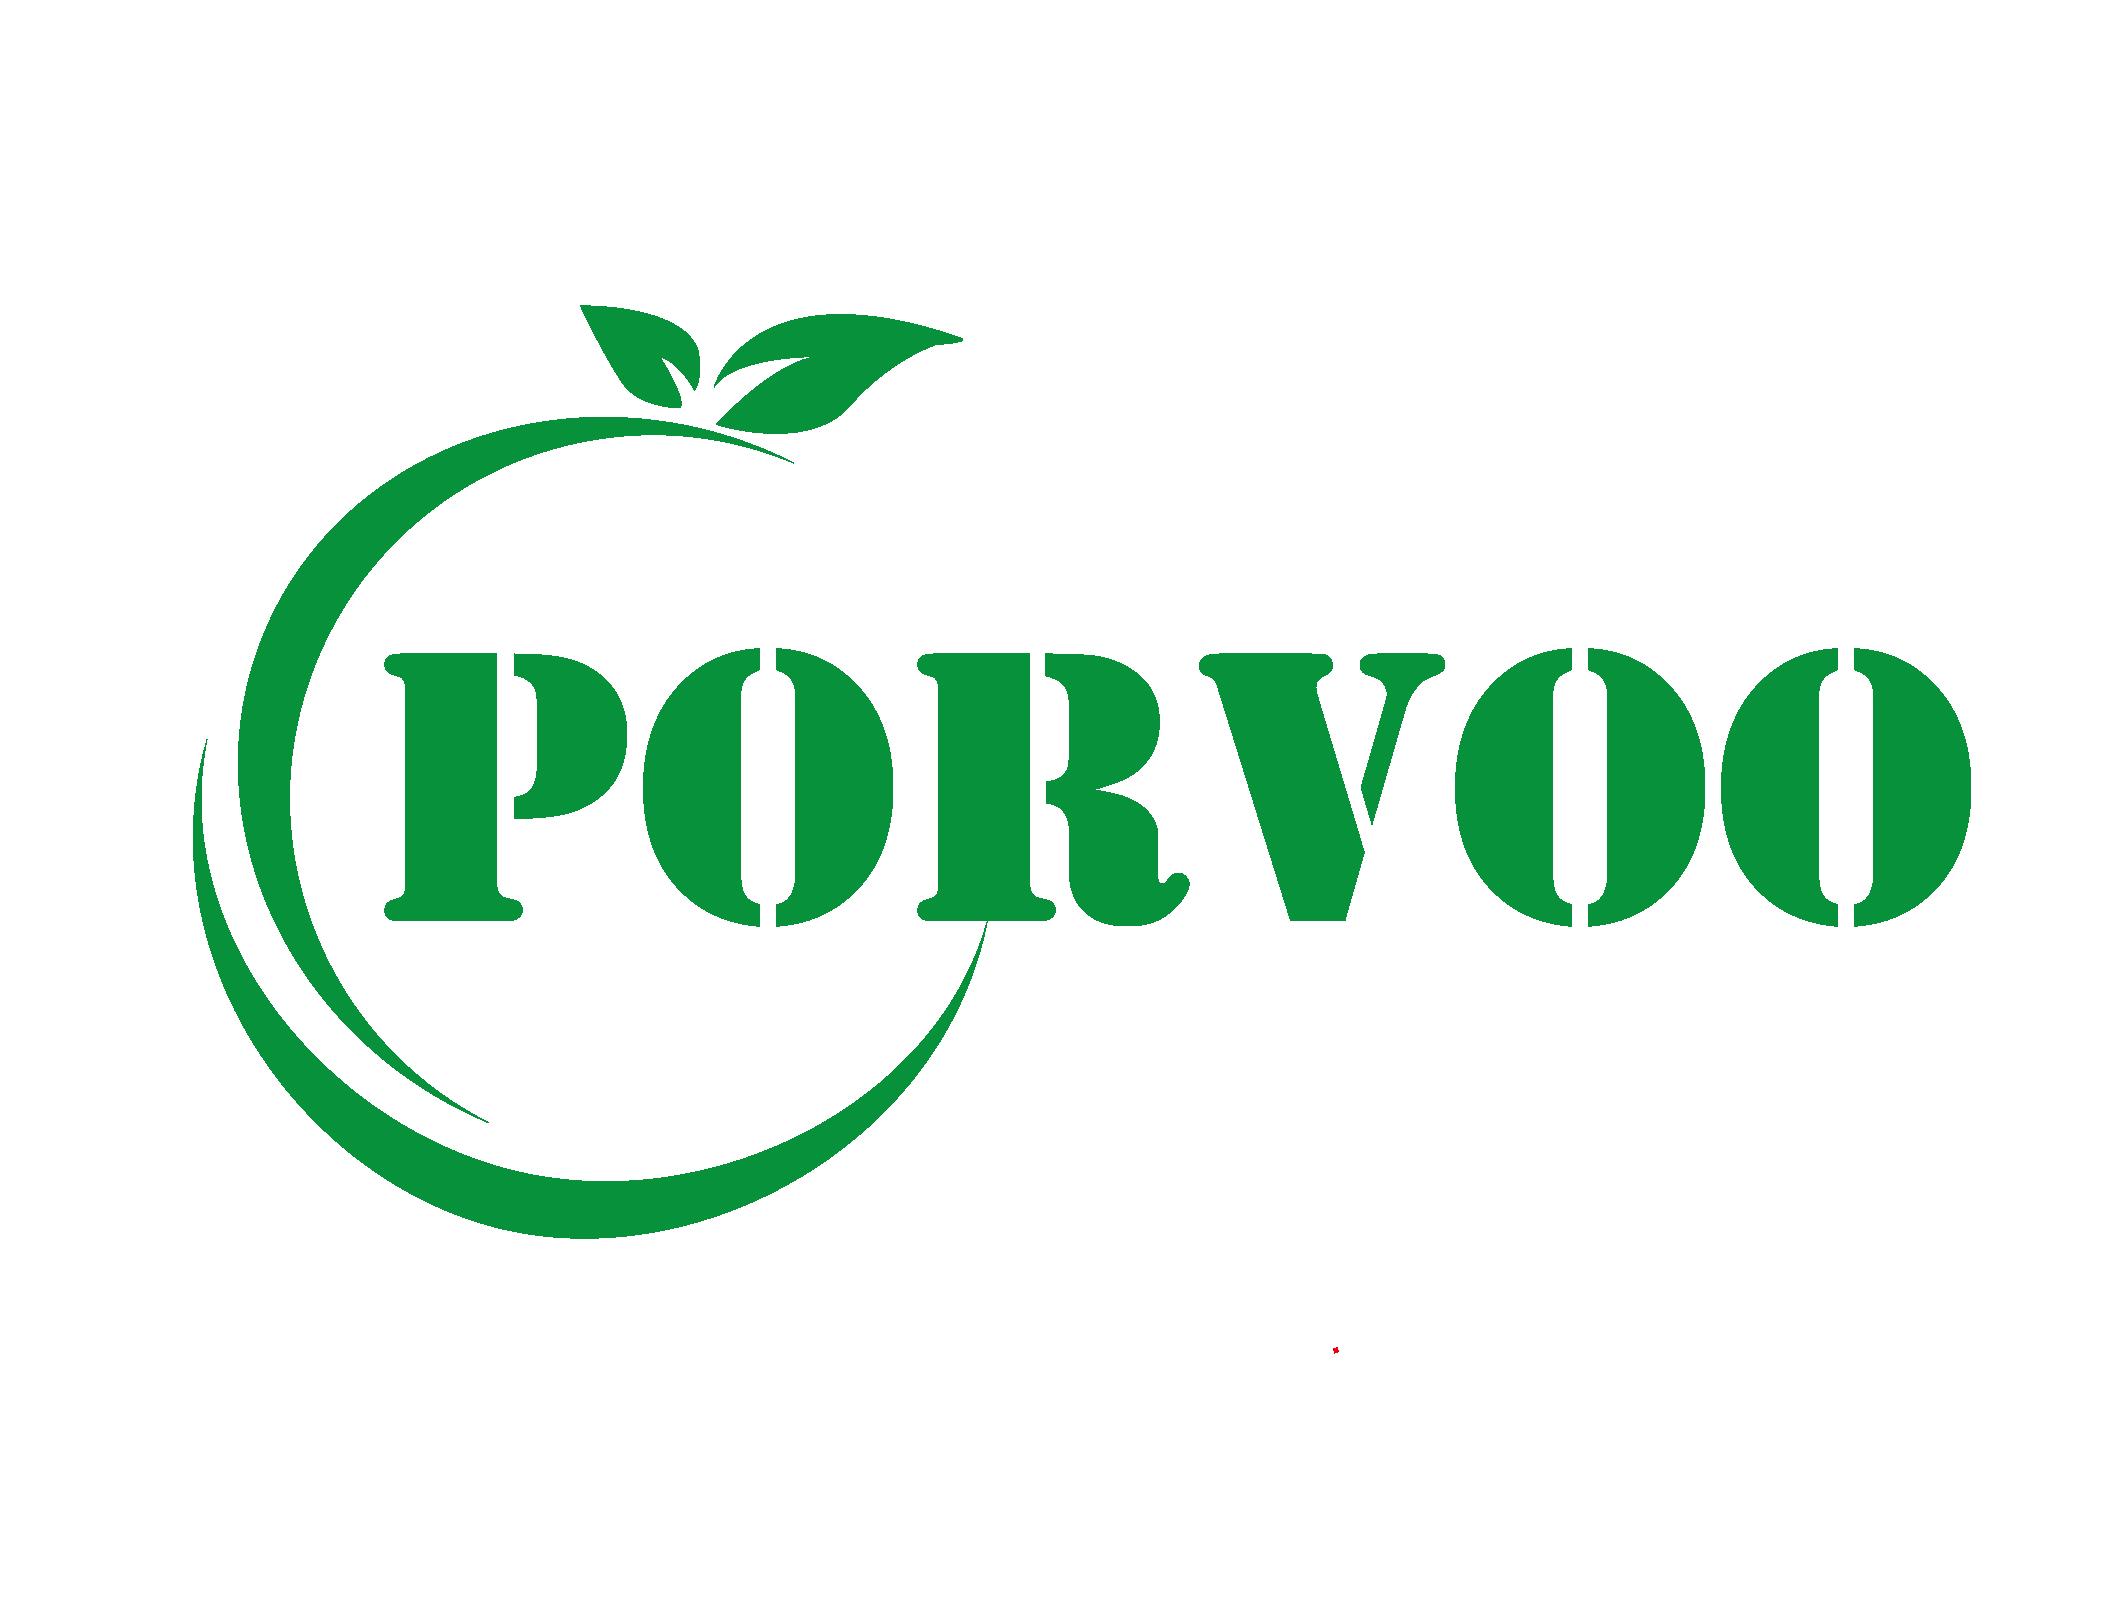 Shaanxi Porvoo Biotech Ltd. logo